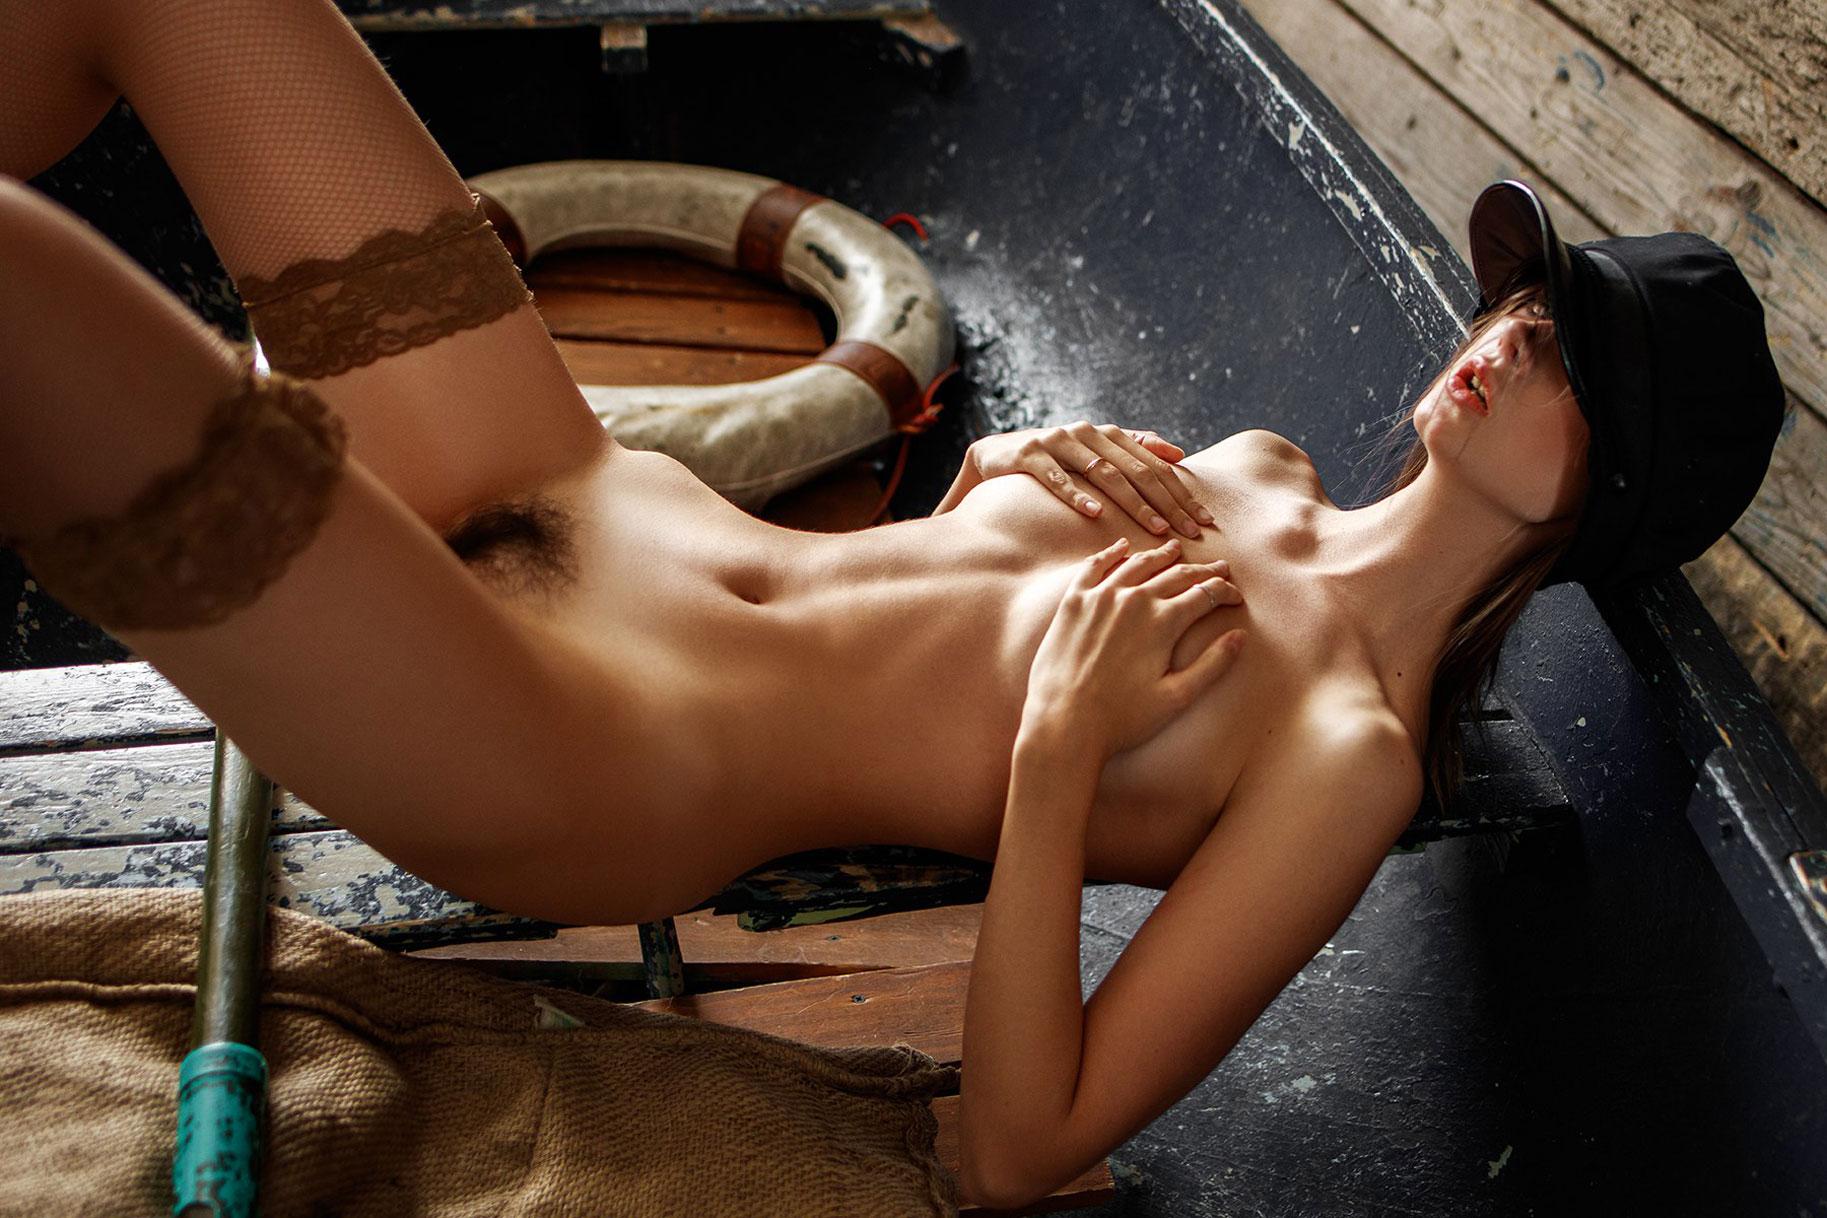 Disha Shemetova nude by Alexey Trifonov